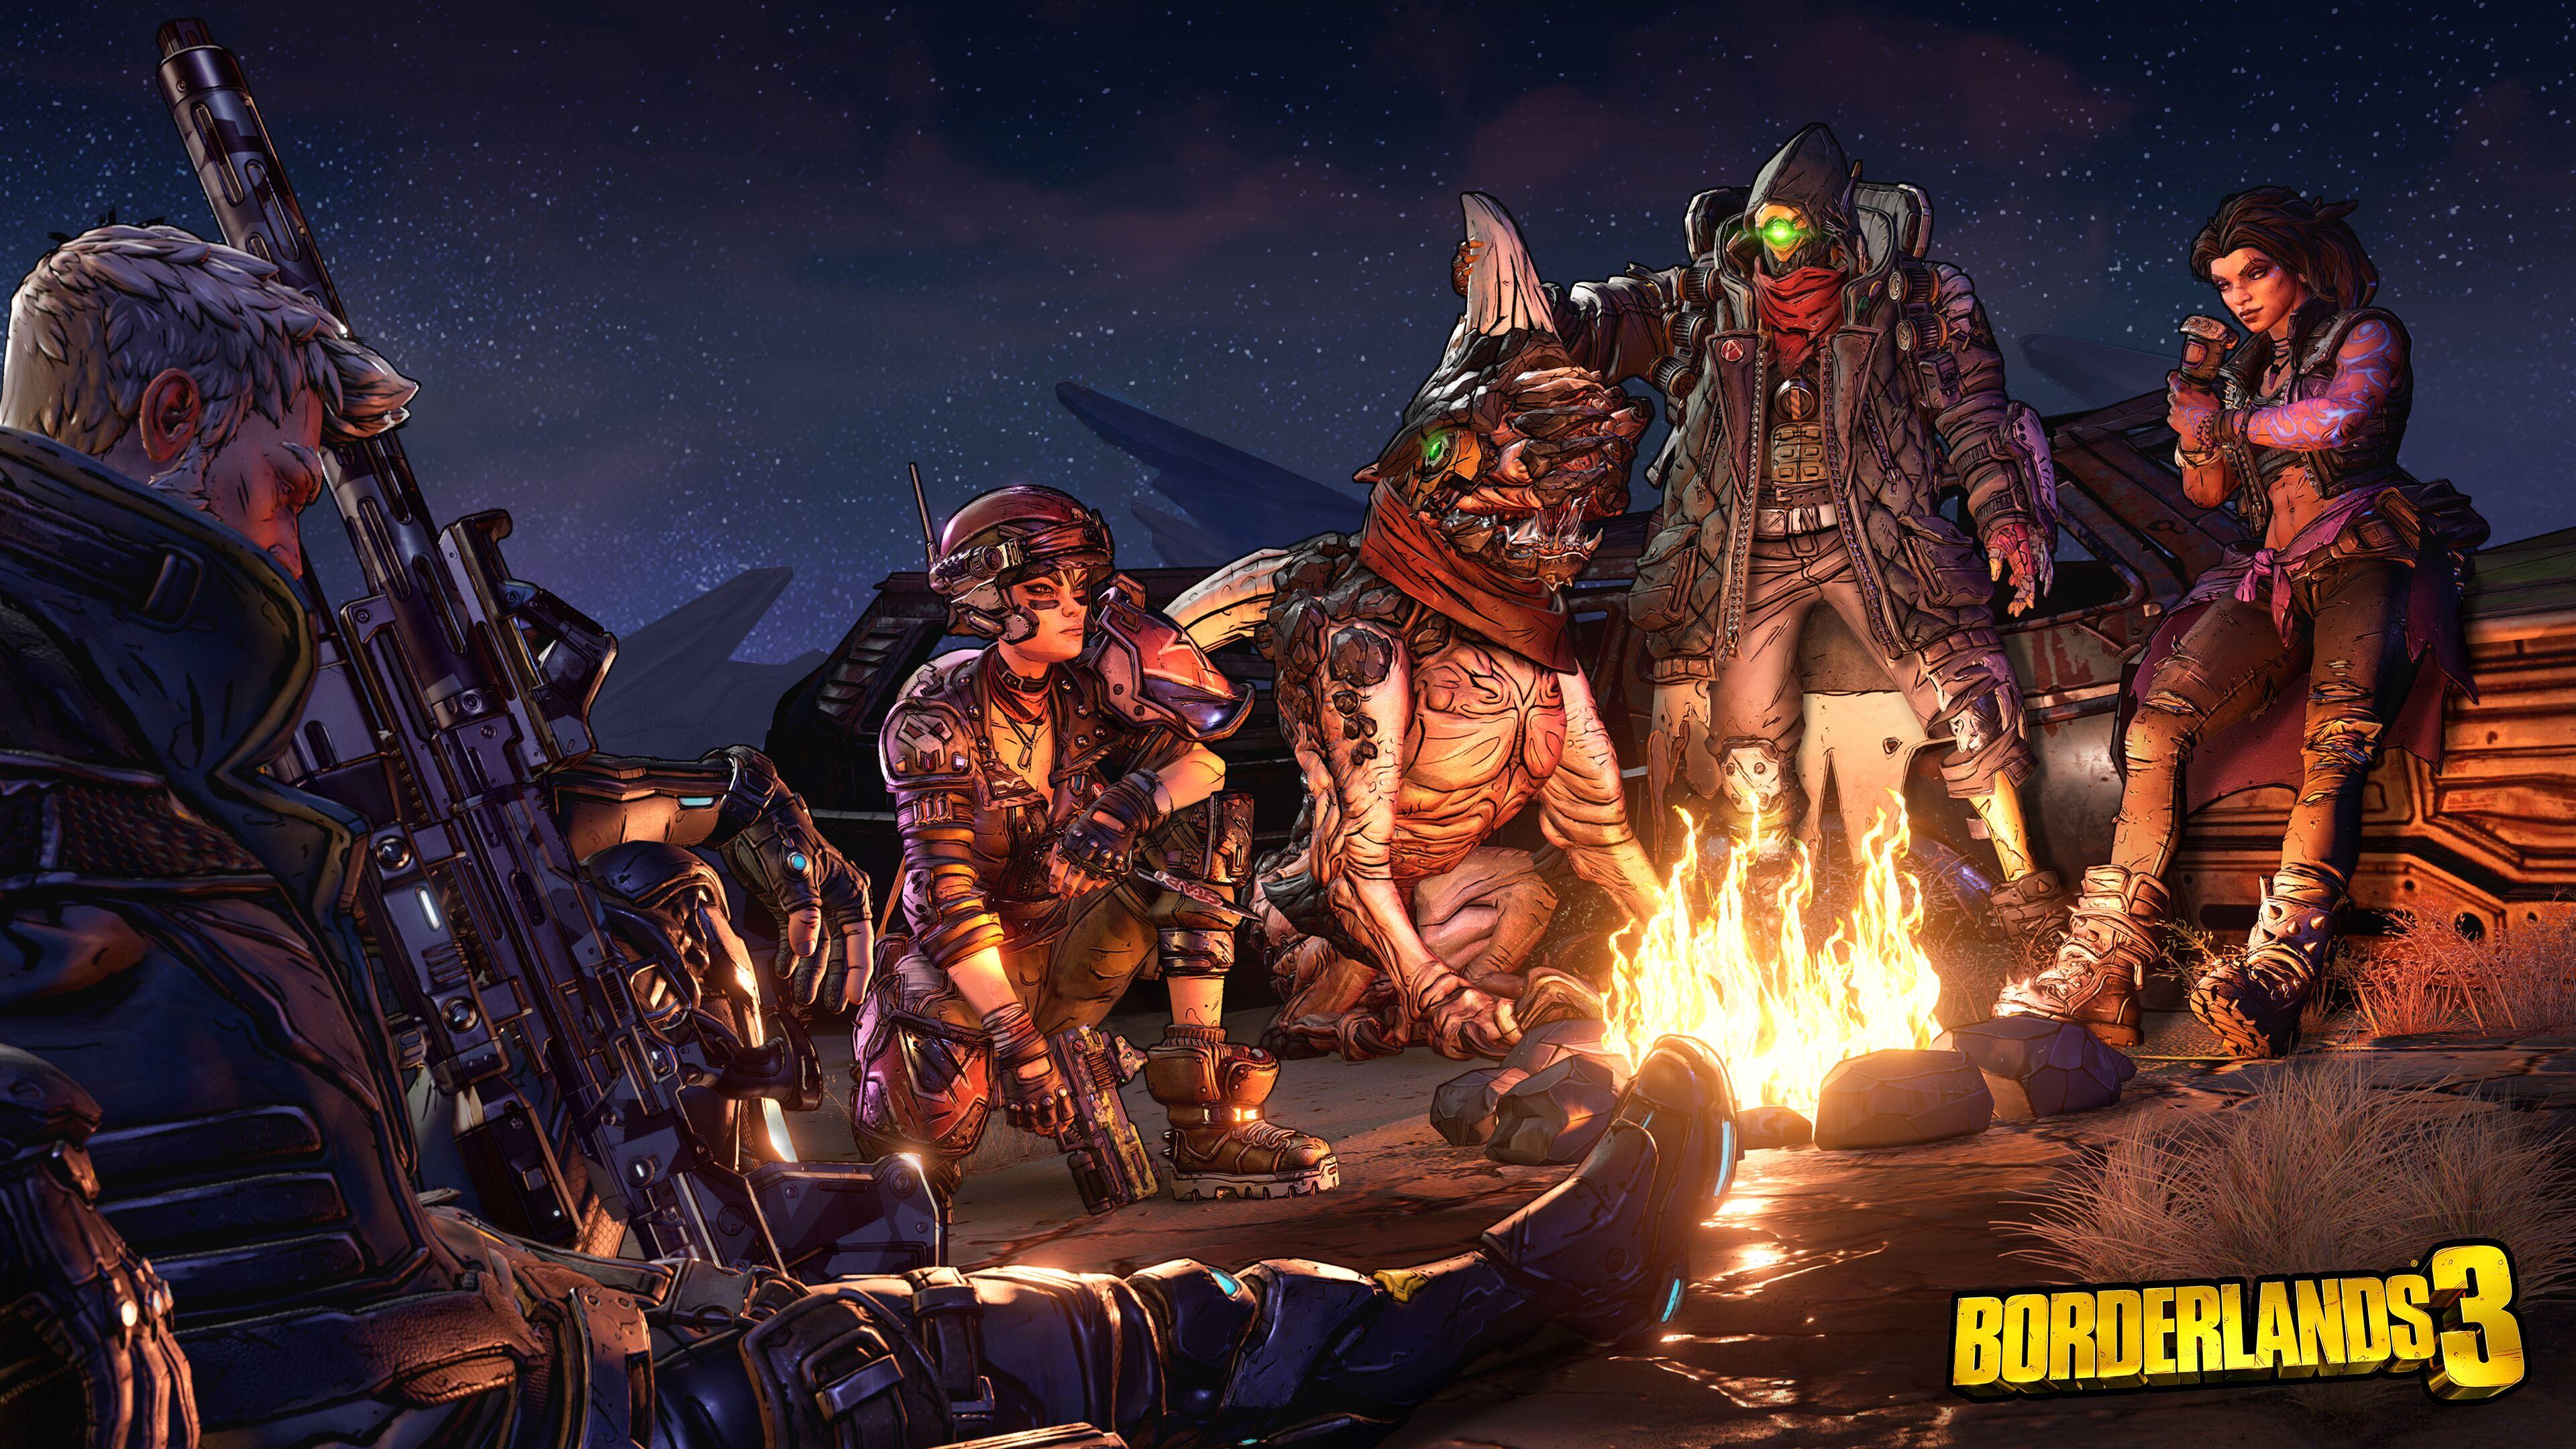 Photo of Borderlands 3 launch trailer